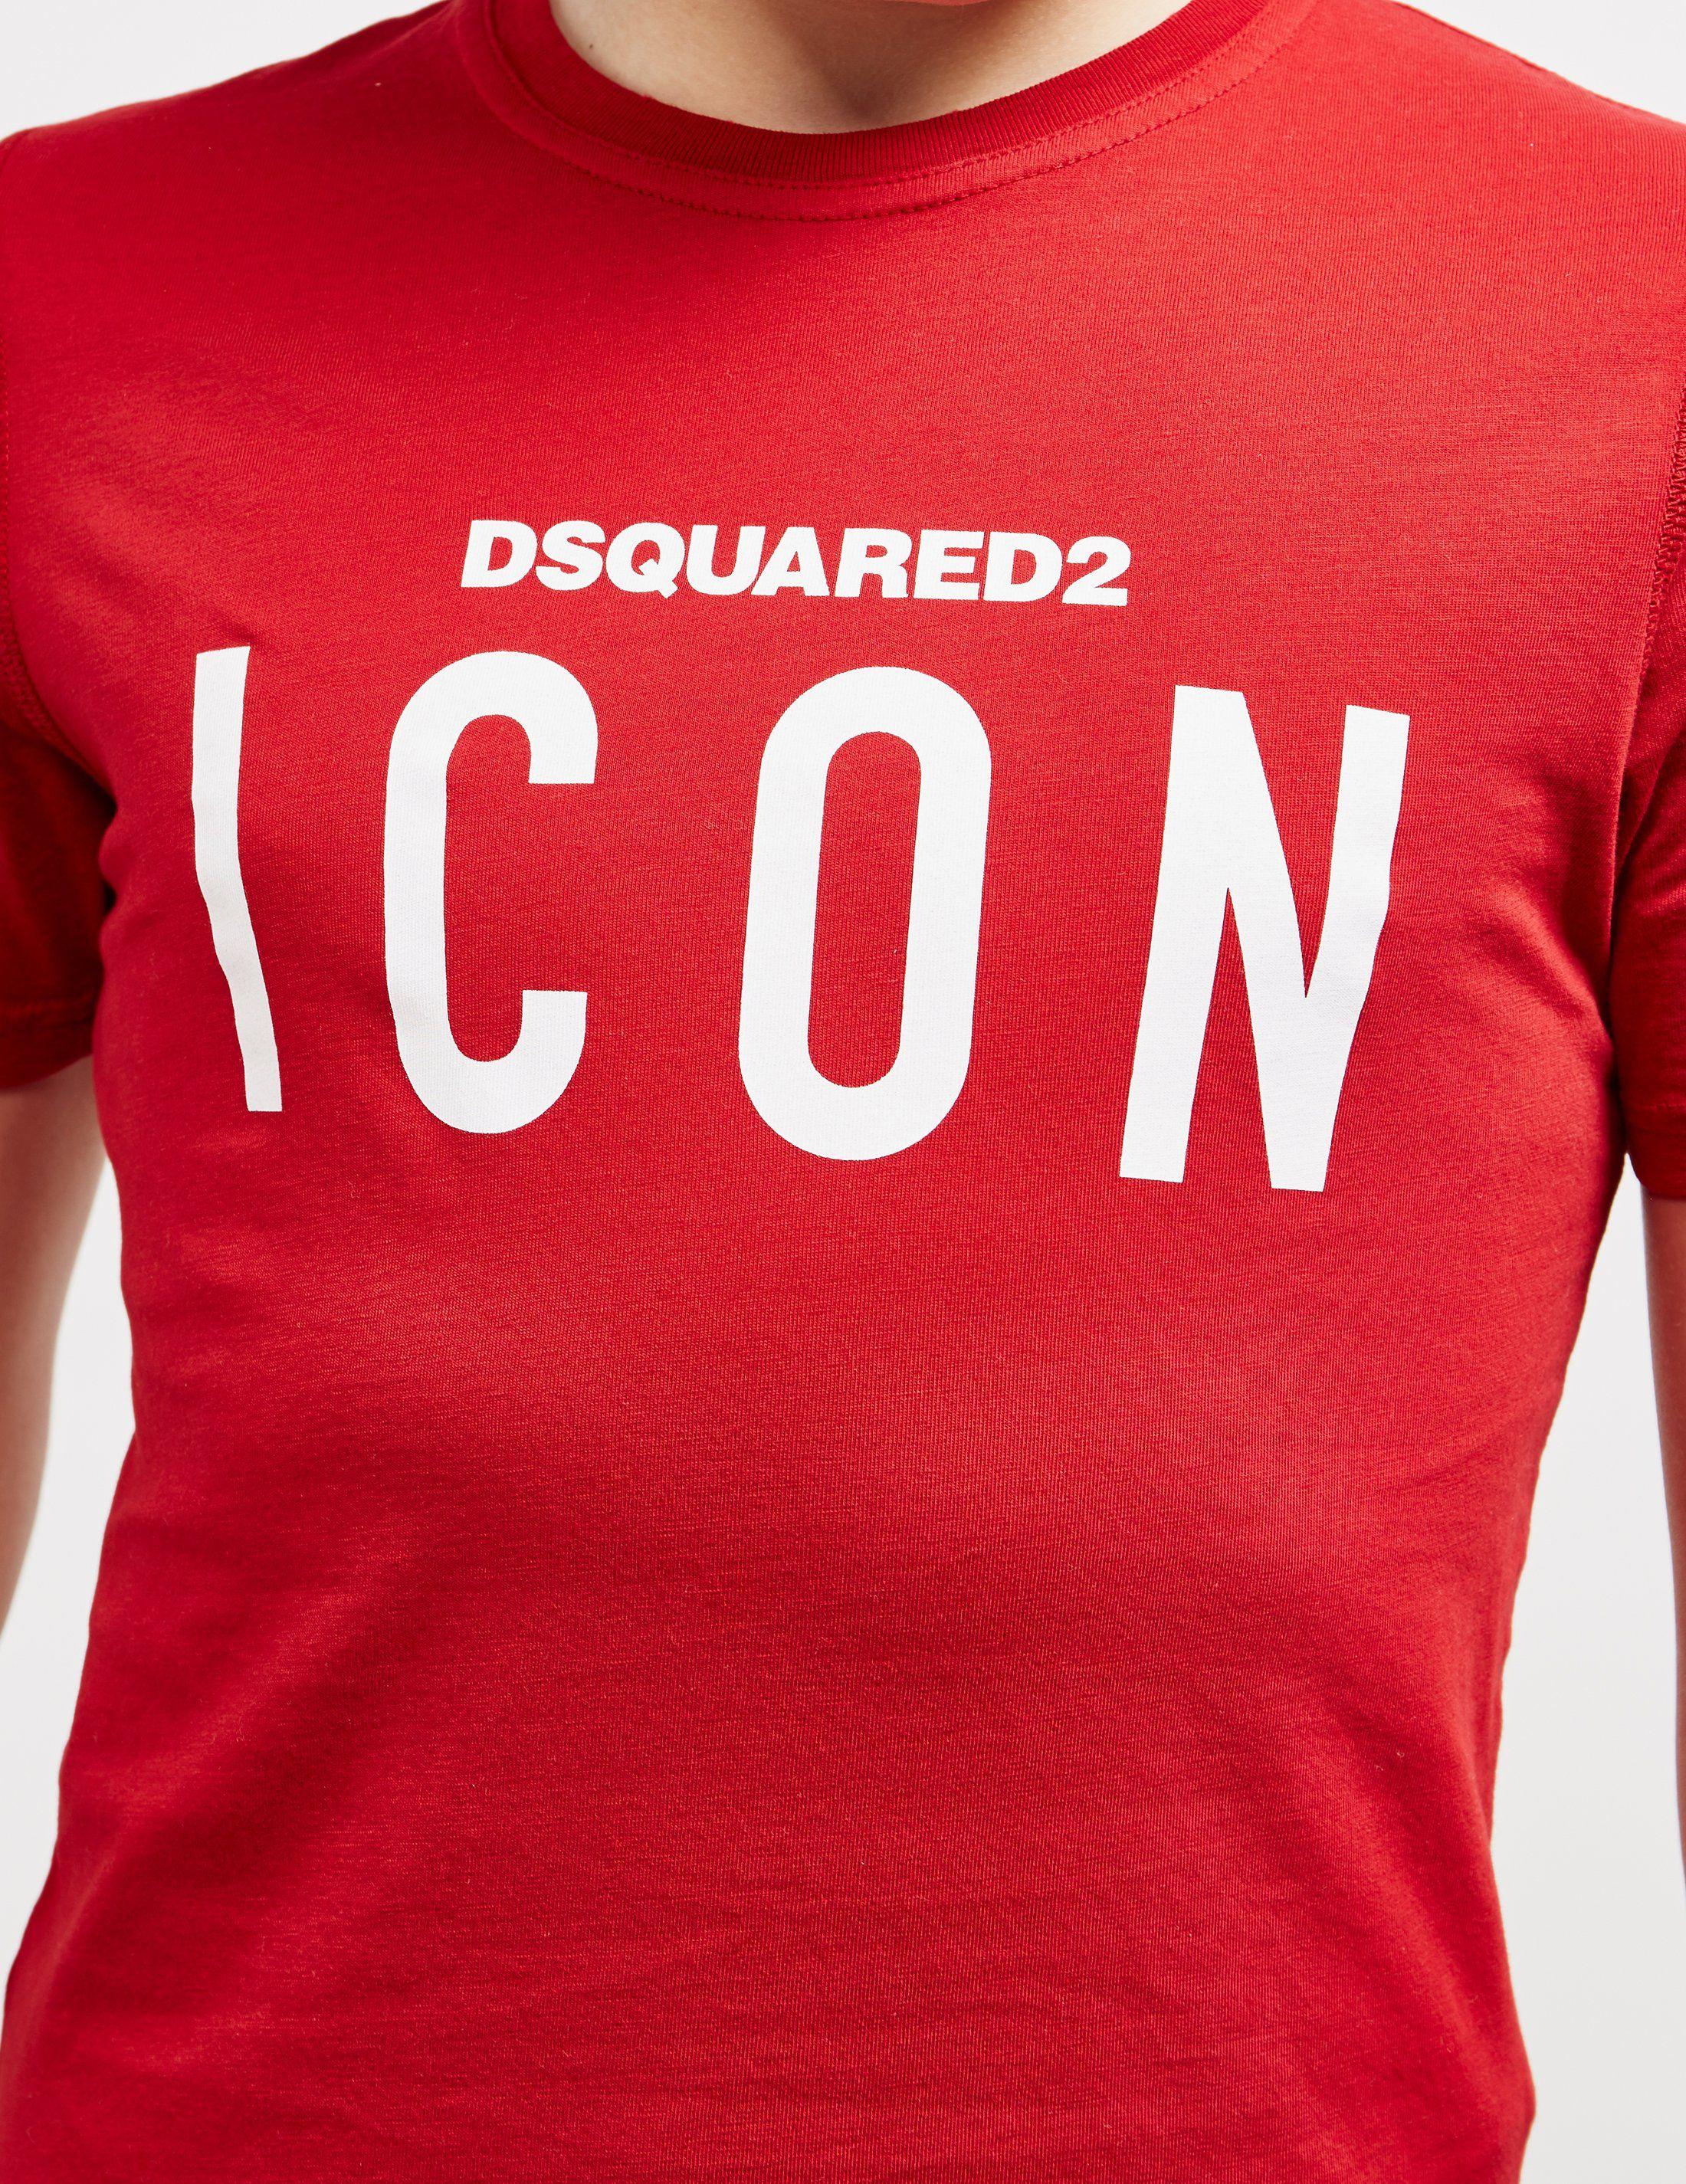 Dsquared2 Icon Short Sleeve T-Shirt